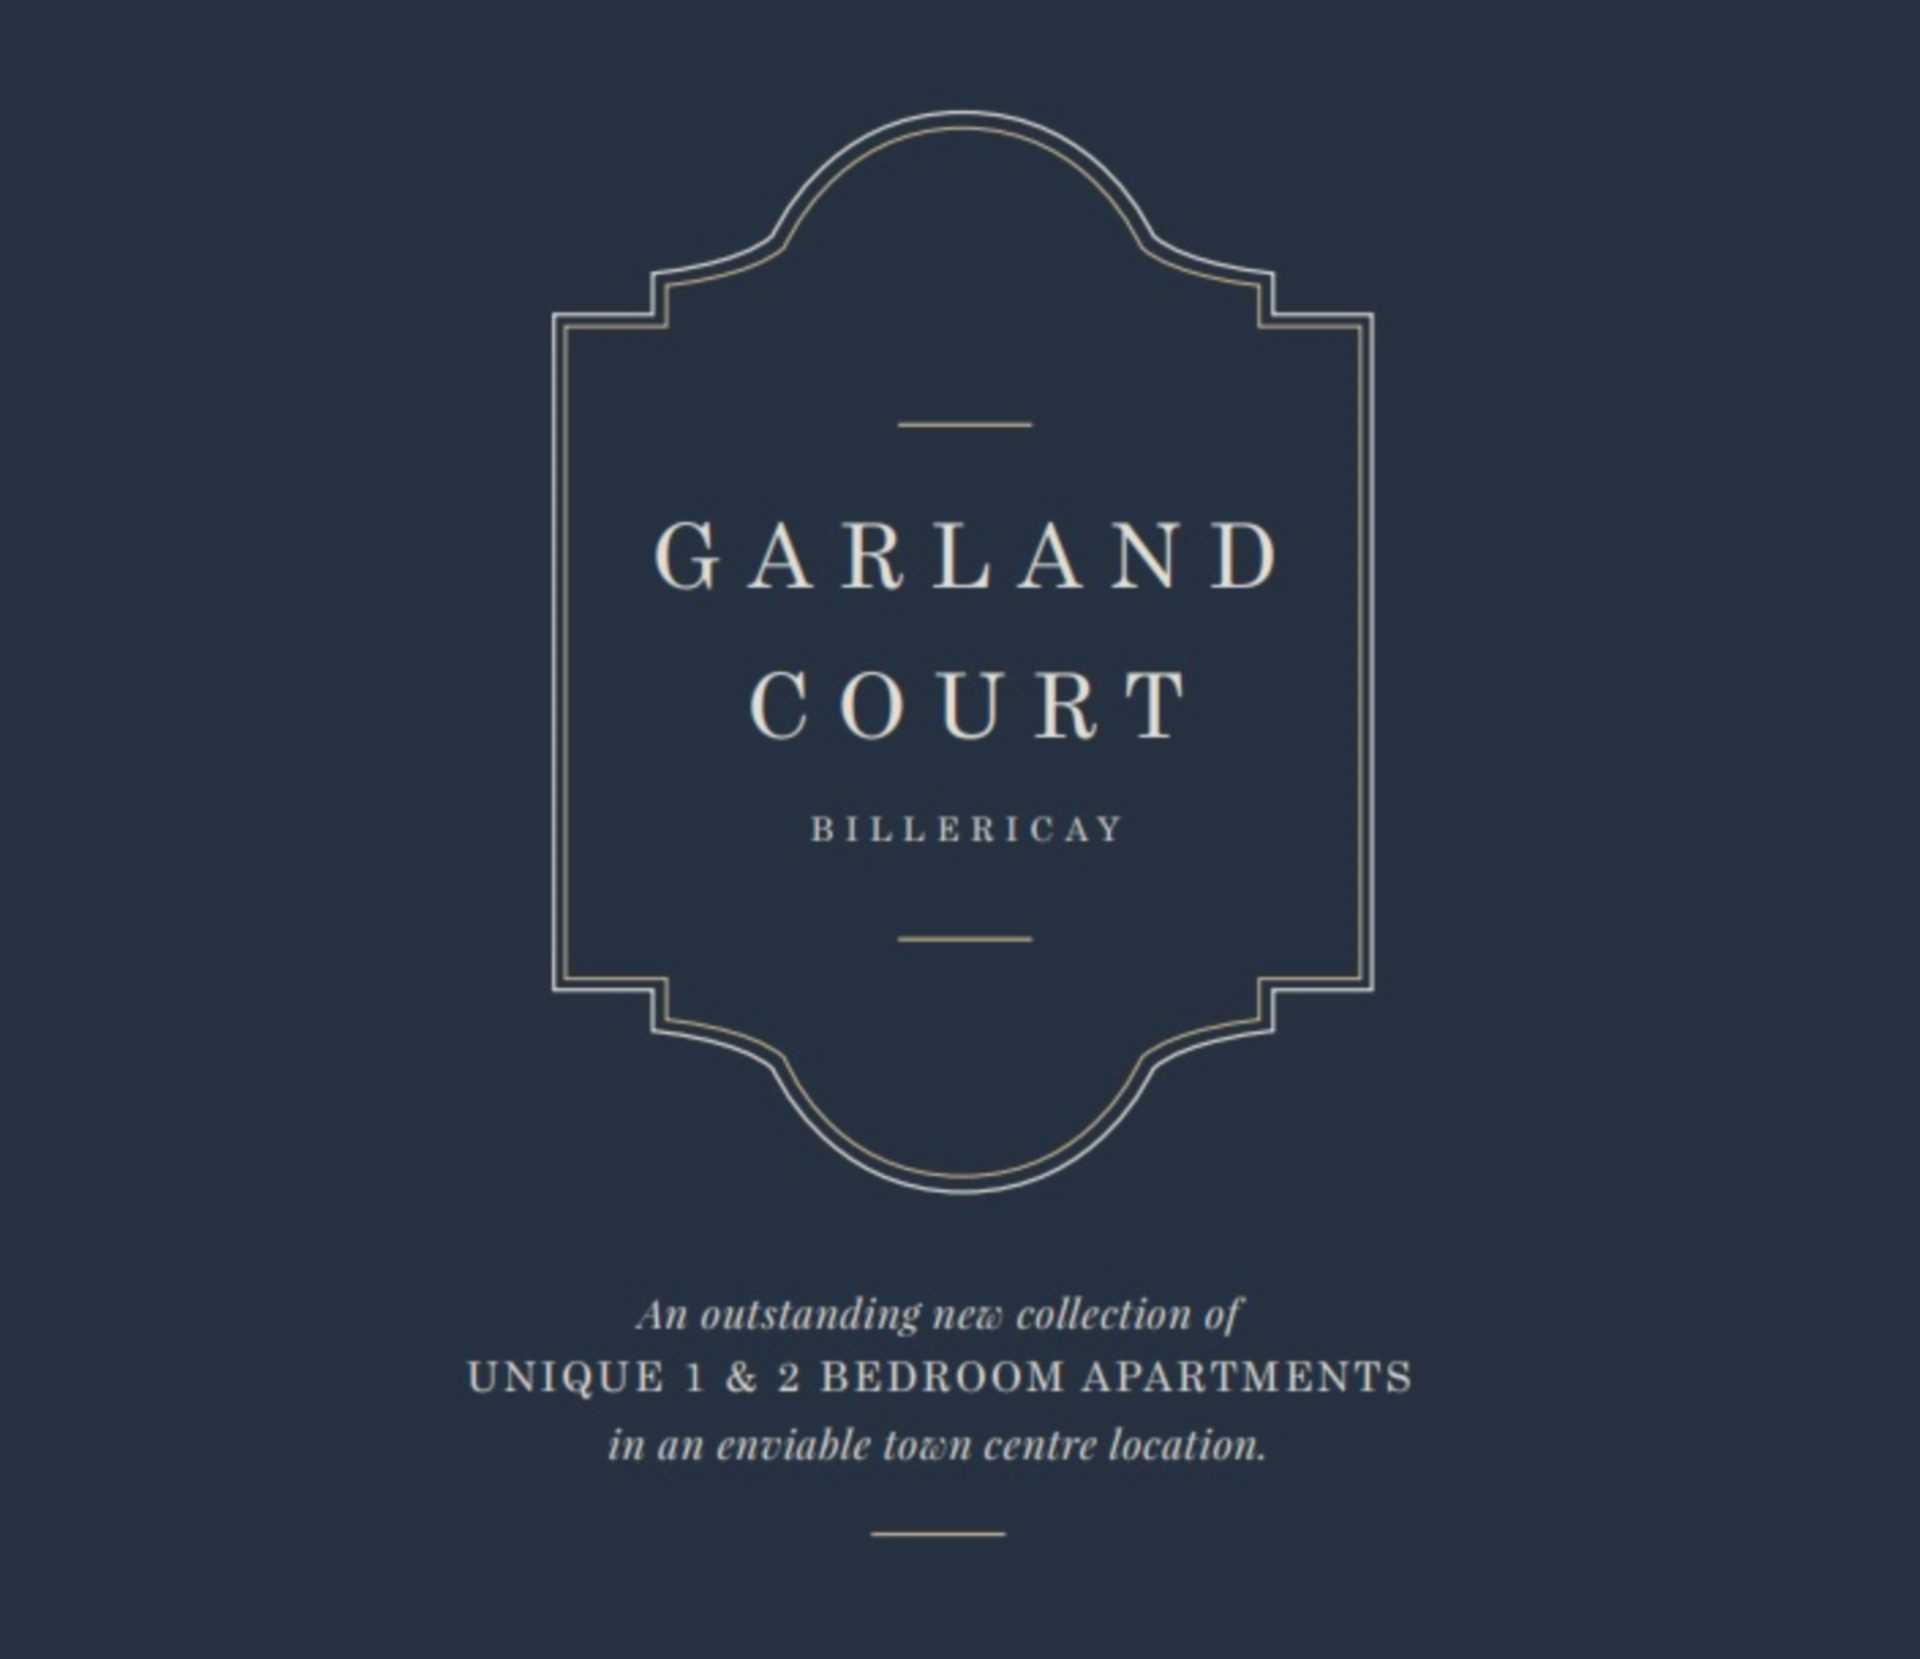 Garland Court, Sun Street, Billericay, Image 17